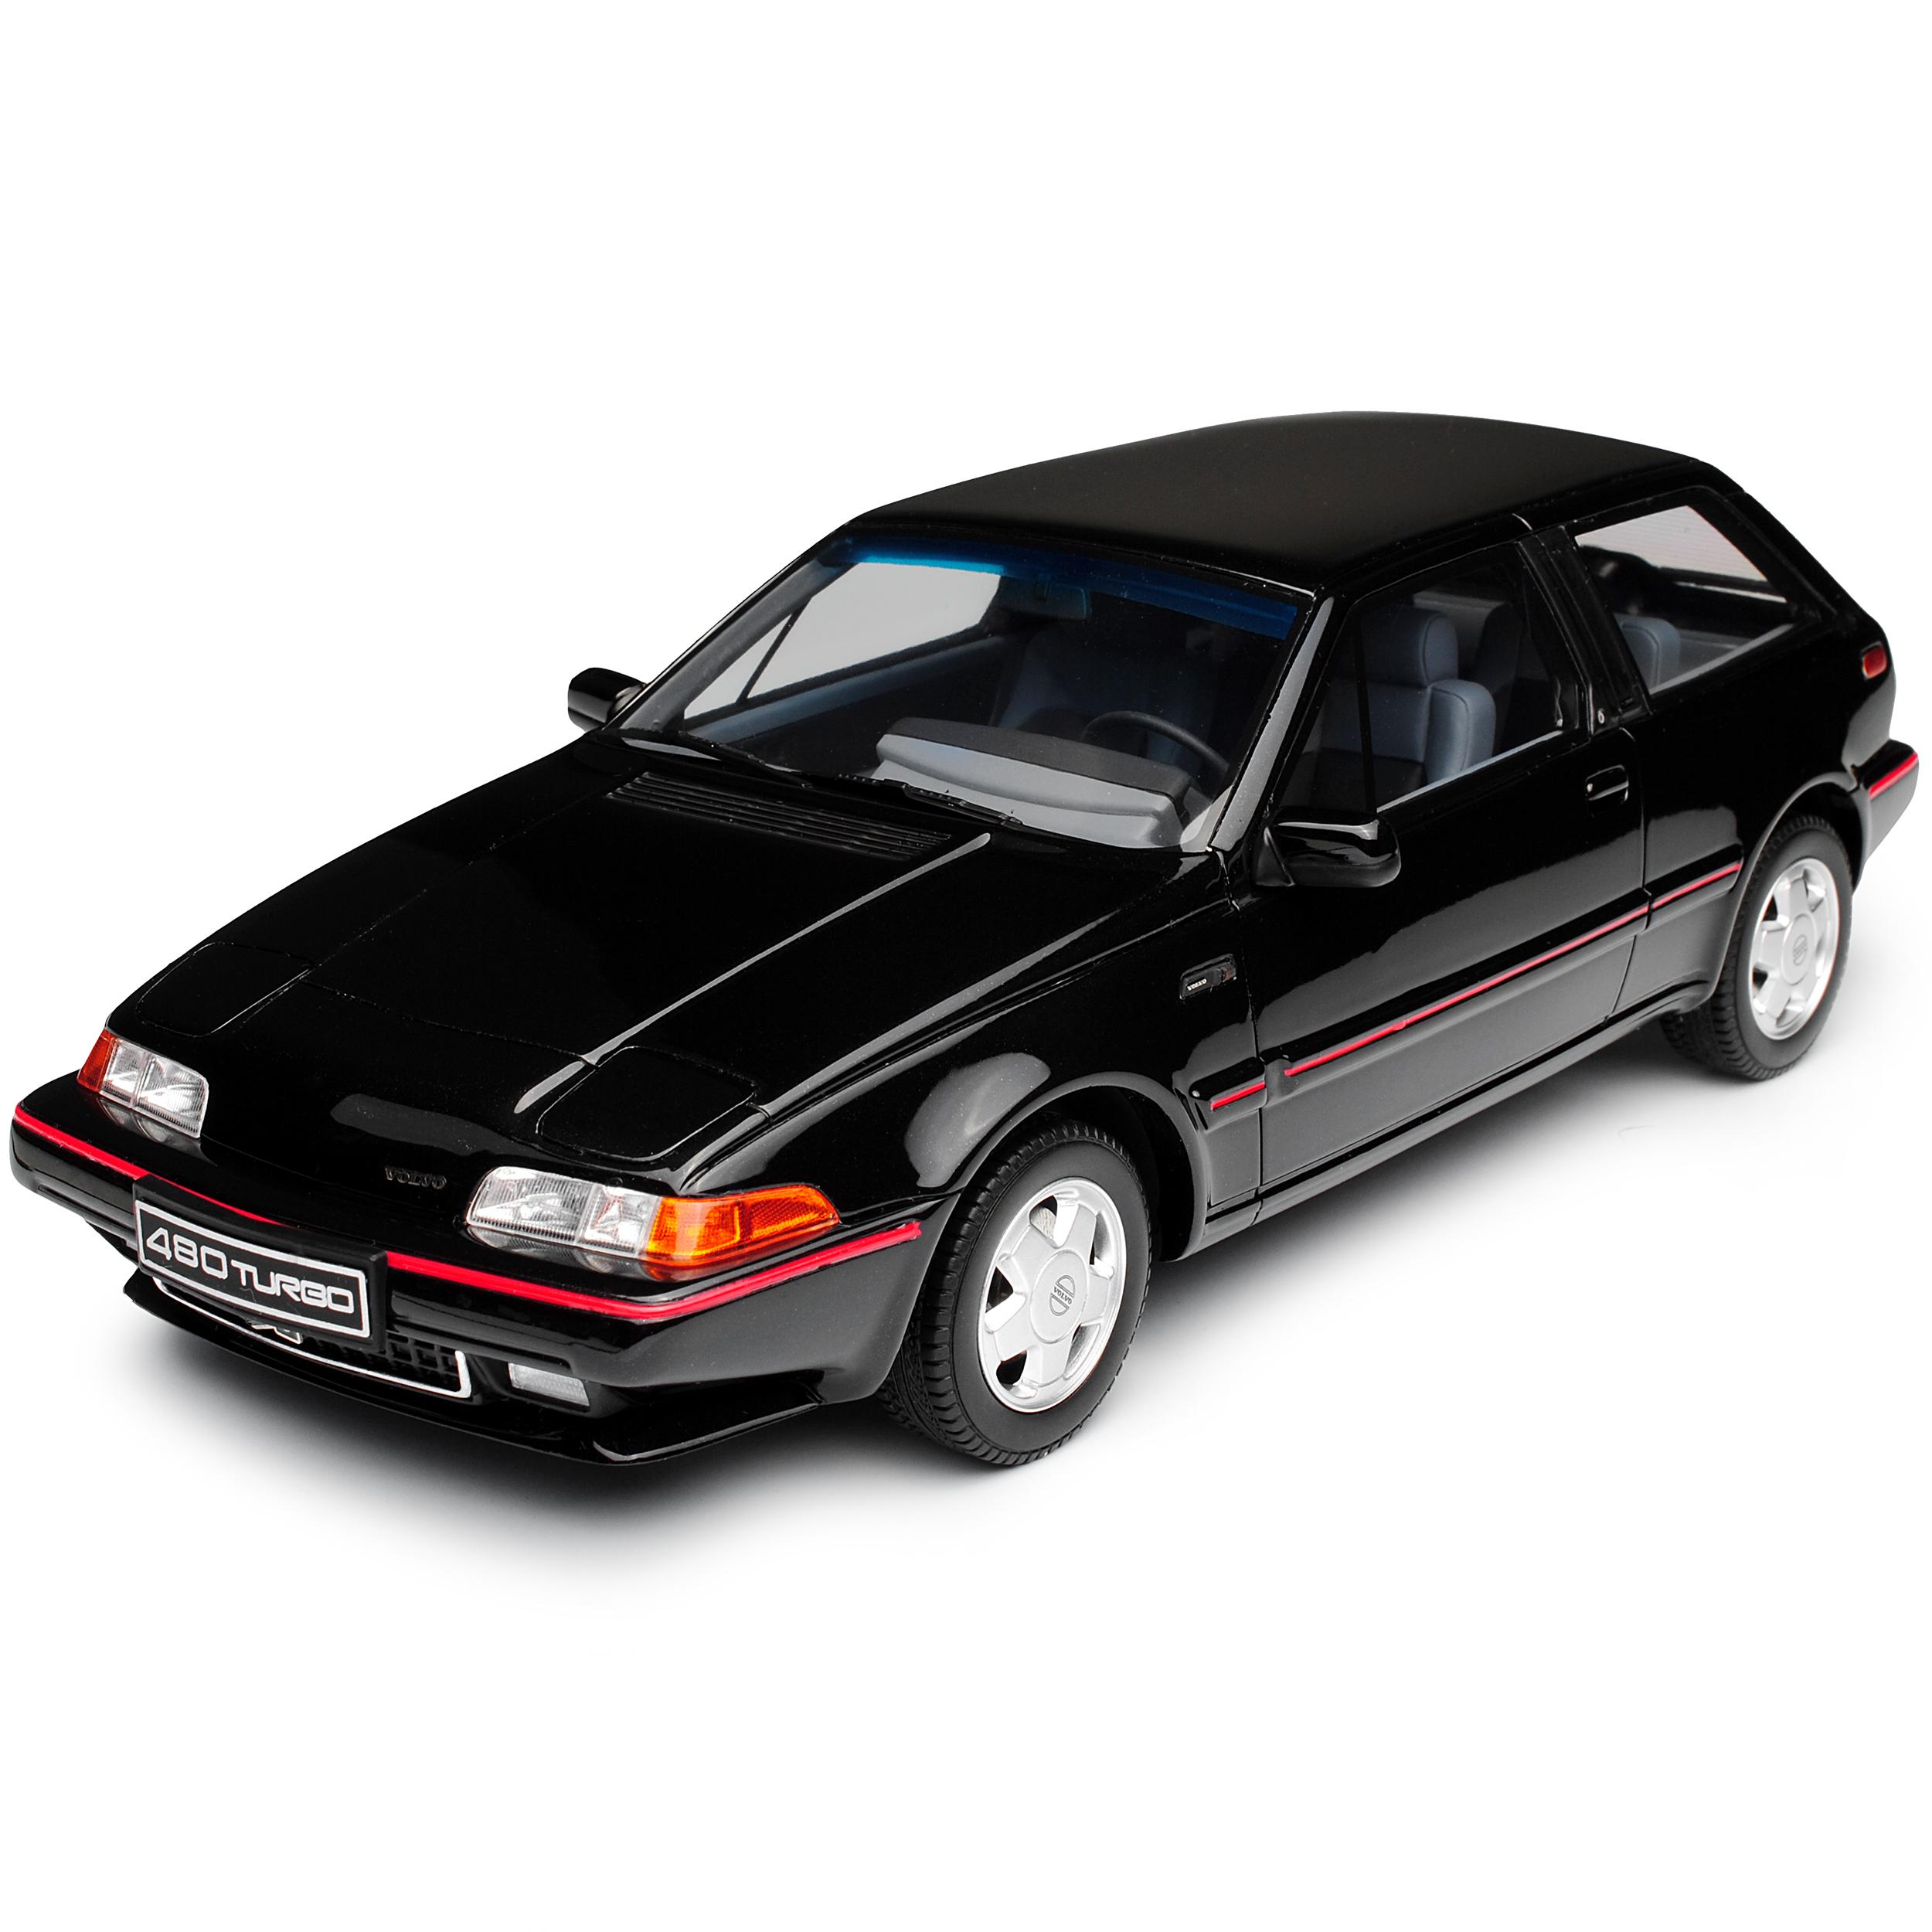 Volvo 480 Turbo Schwarz 1986-1995 Nr 740 1//18 Otto Modell Auto mit oder ohne i..